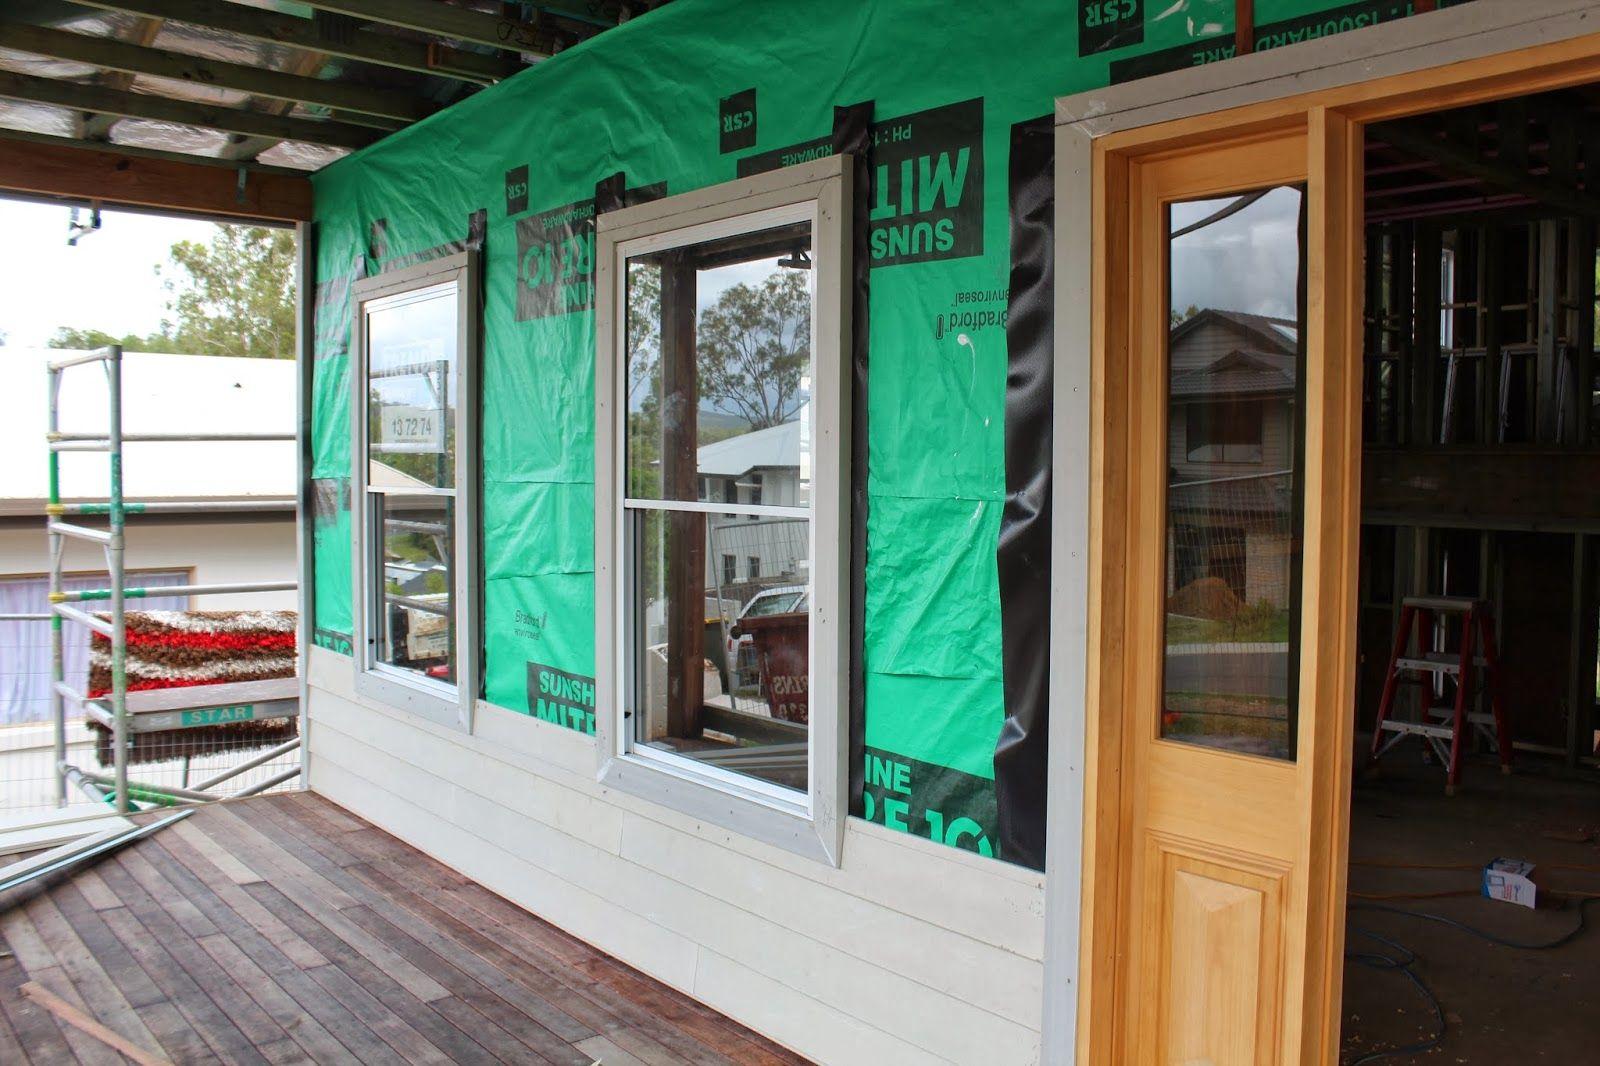 It S A New House Slim Aluminium Sash Windows With Timber Architraves External French Doors Architrave Aluminium Doors